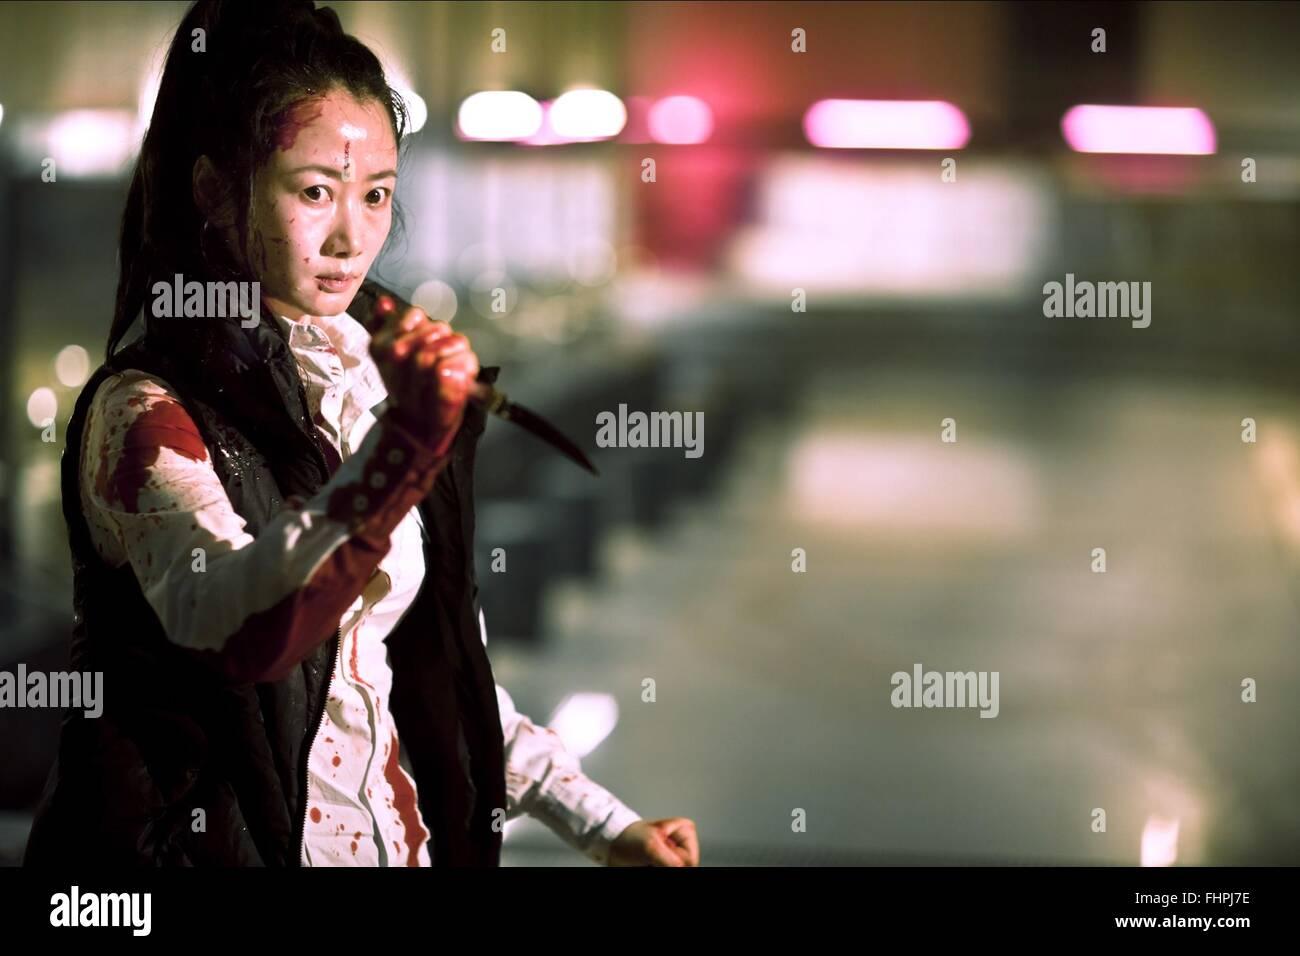 TAO ZHAO A TOUCH OF SIN; TIAN ZHU DING (2013) - Stock Image